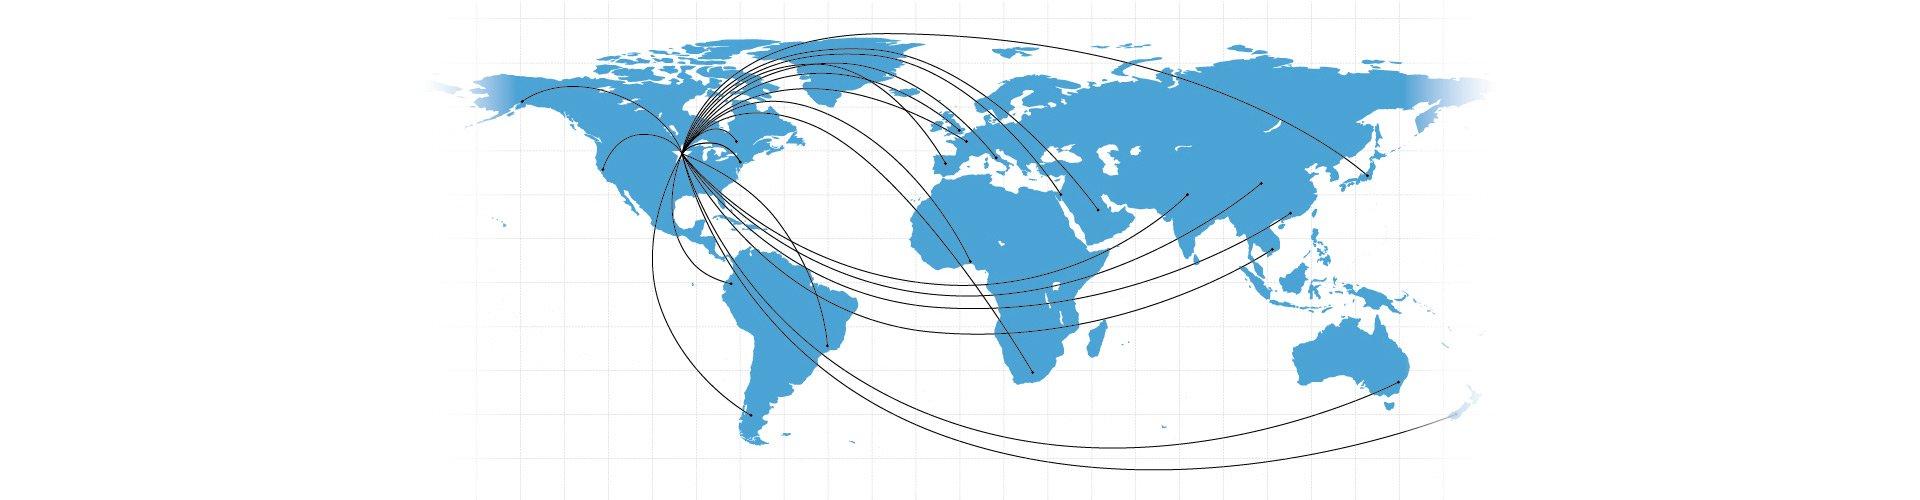 gsi_worlddistributionmap_1920x500